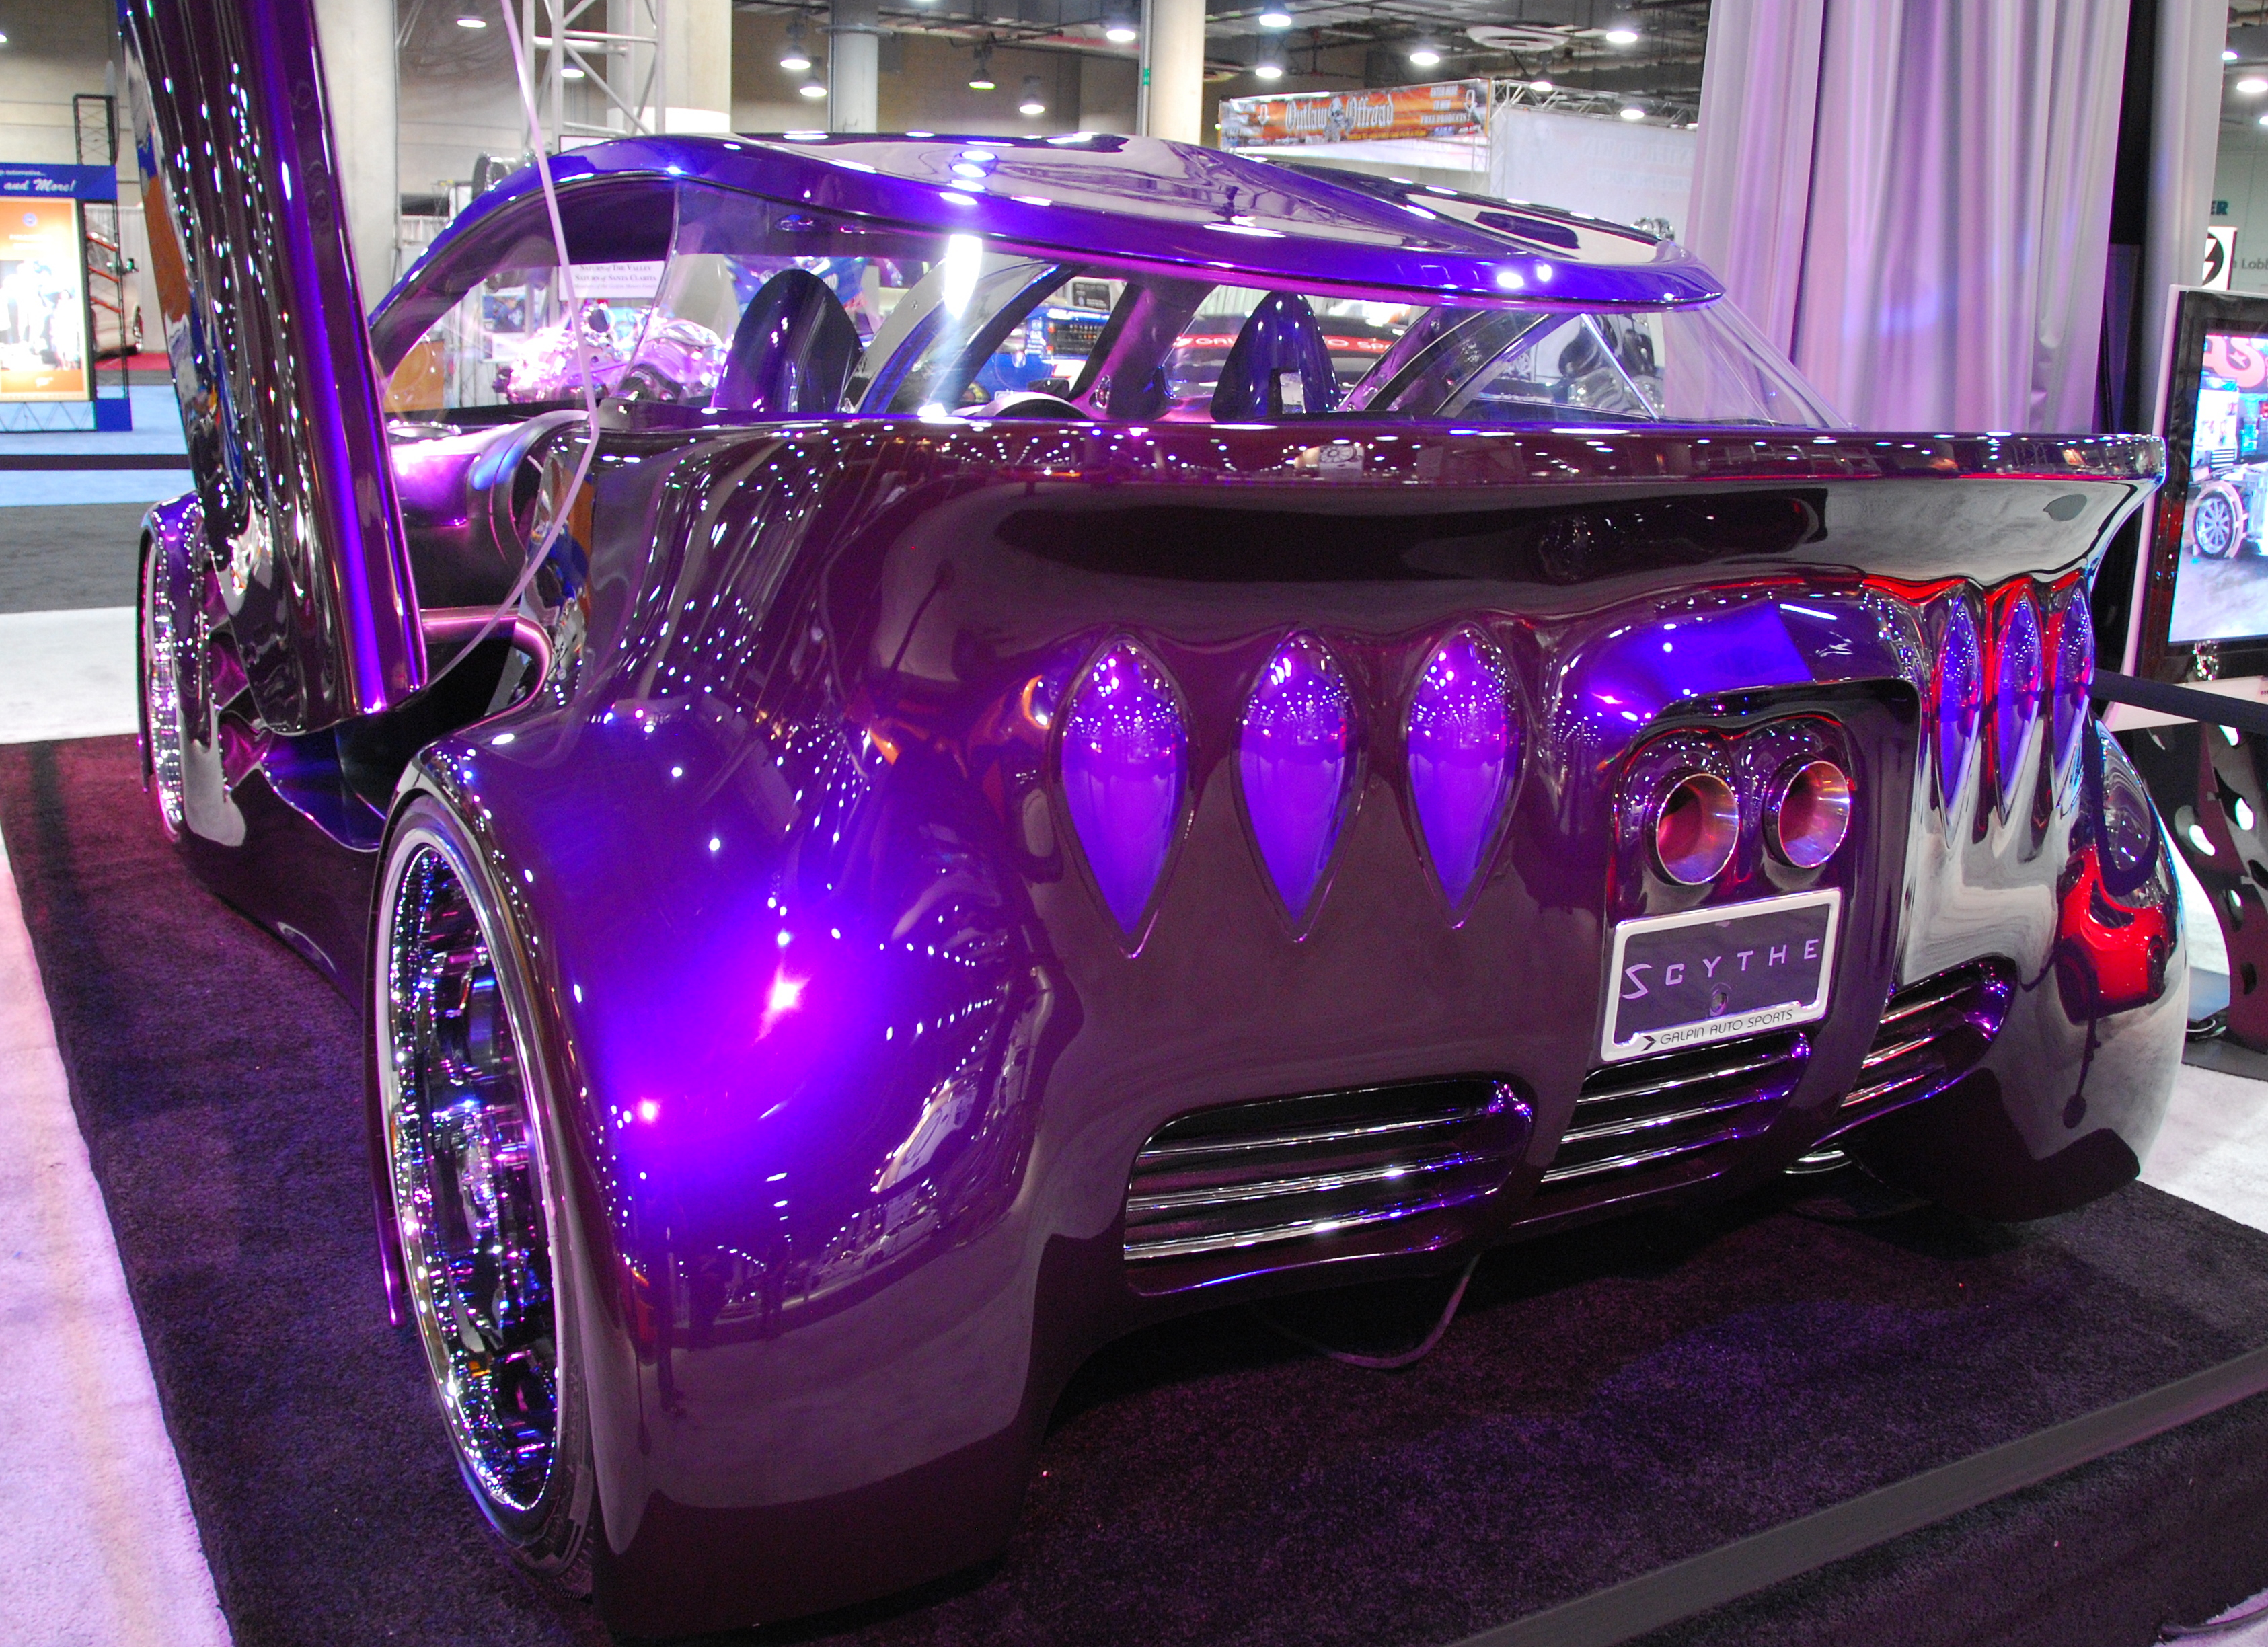 LA Auto Show Exotic Cars OhGizmo - Car show cars